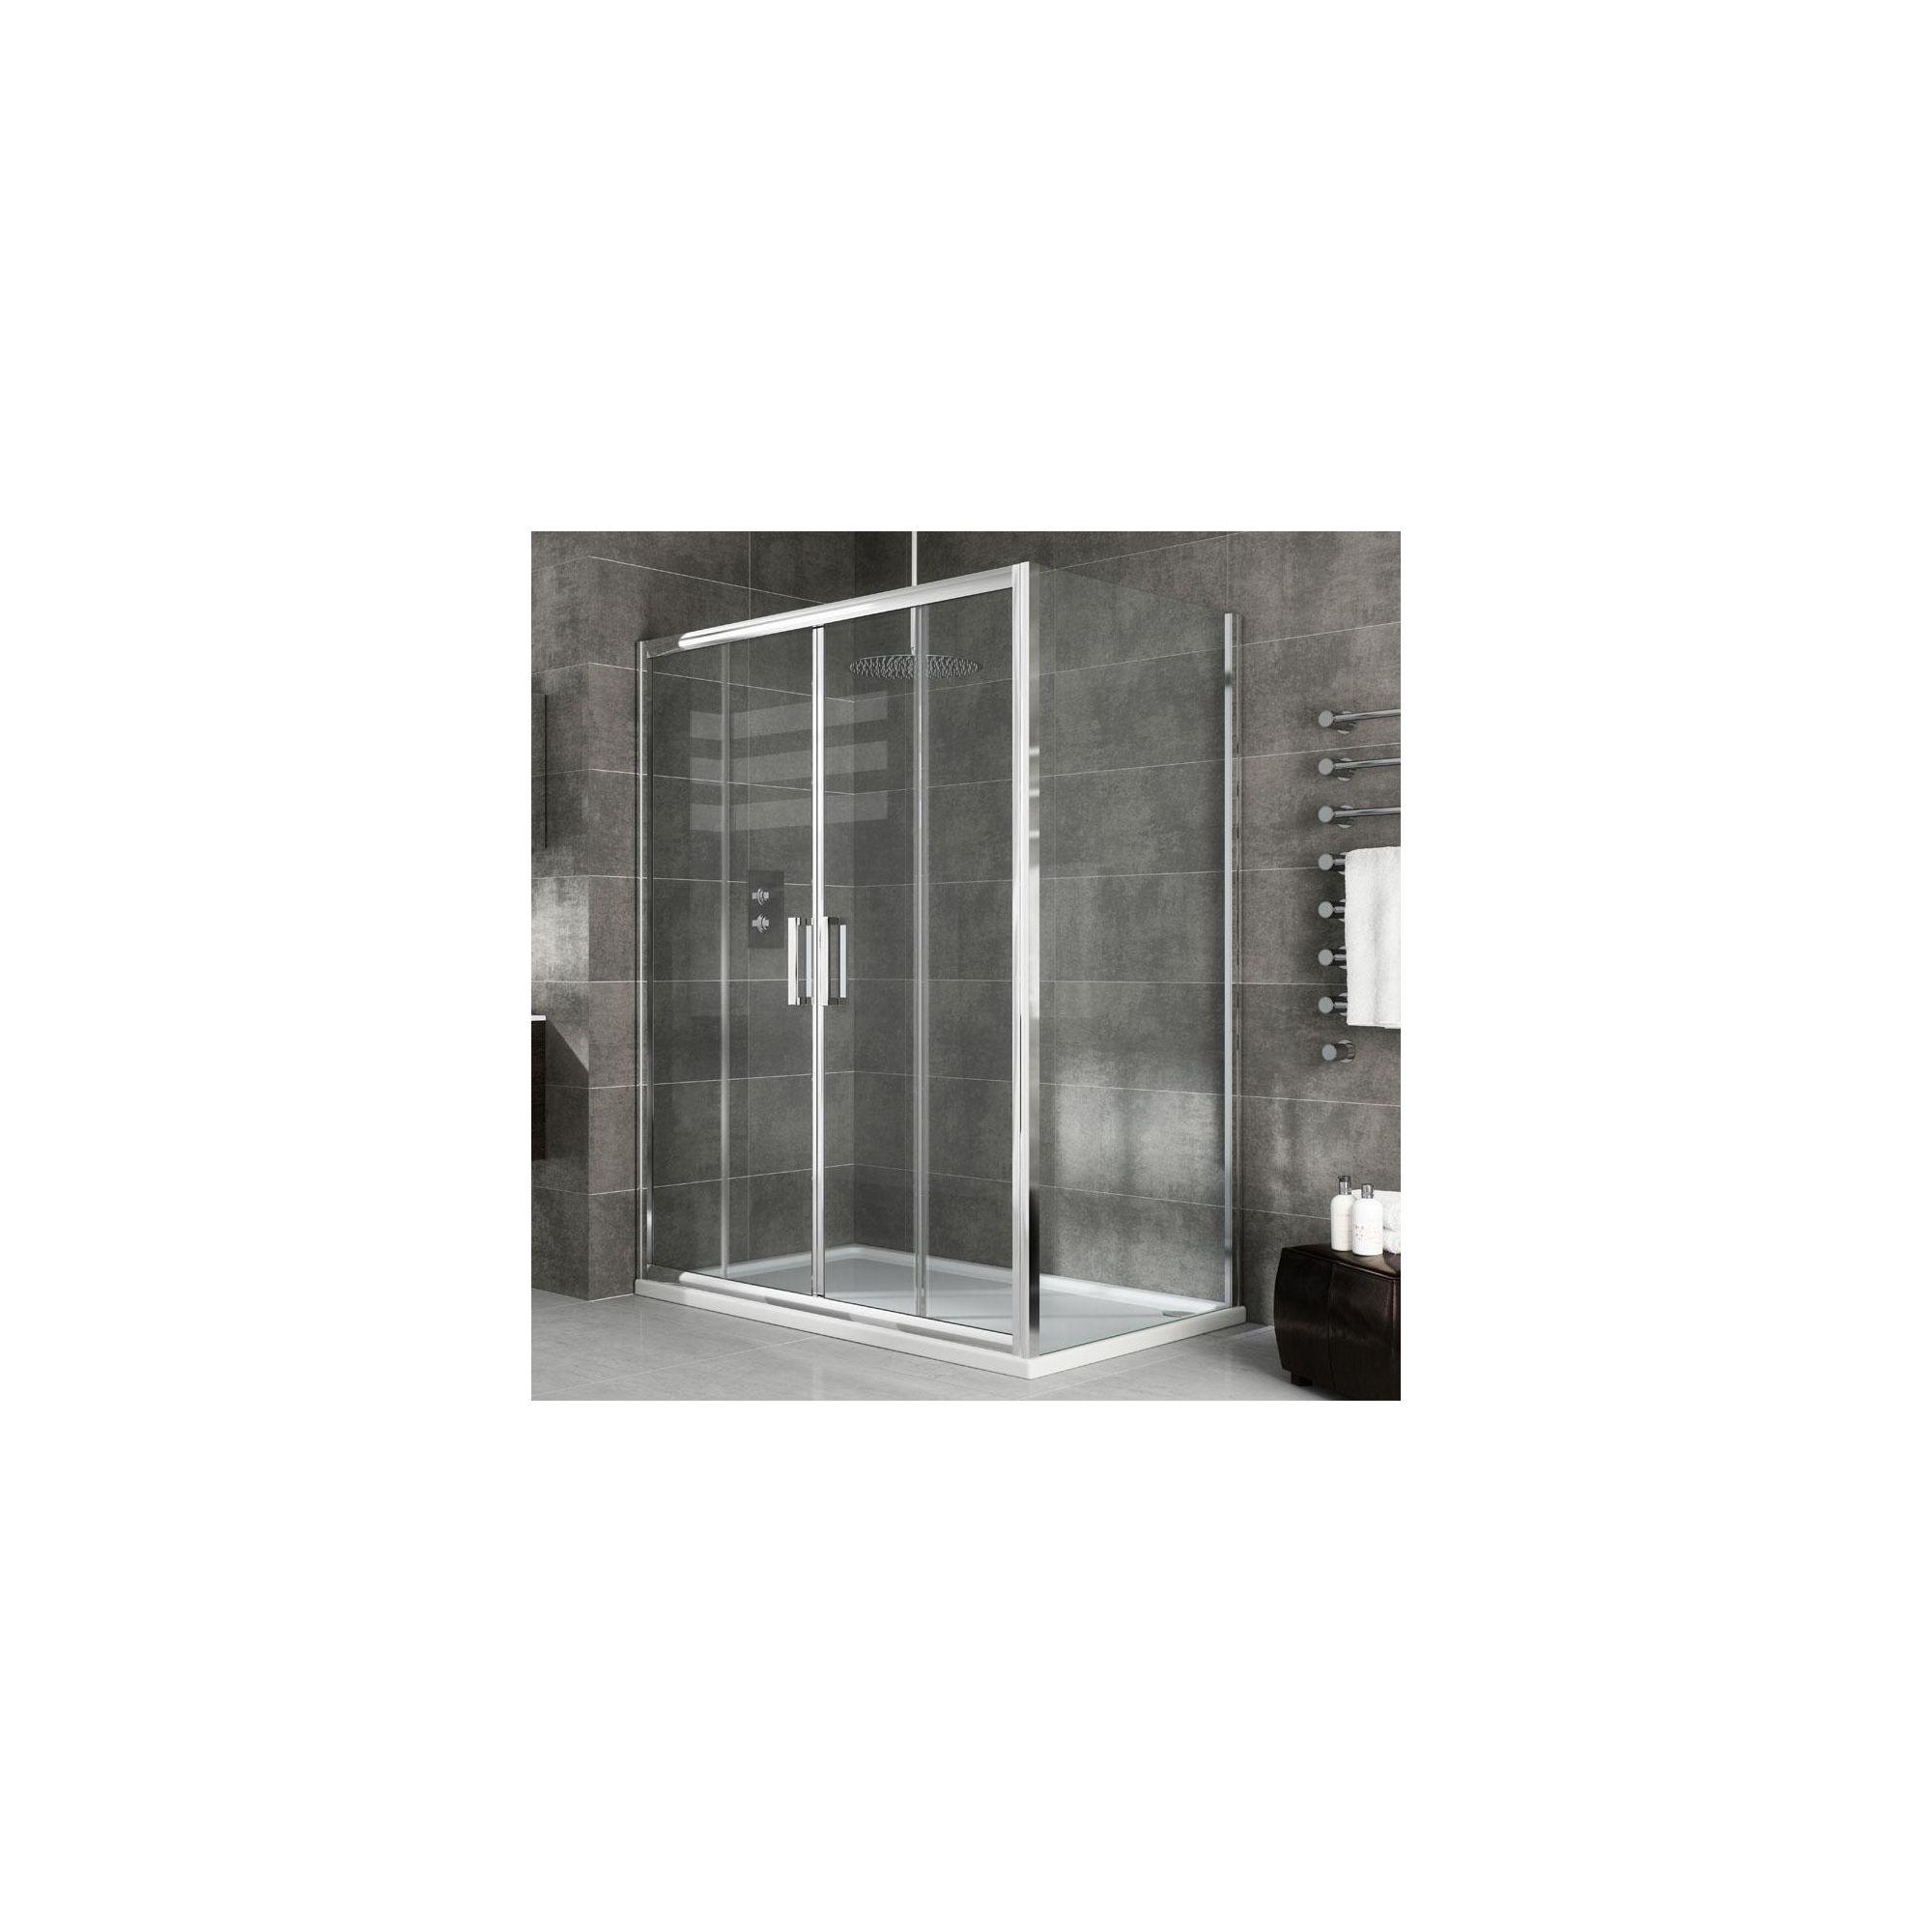 Elemis Eternity Four-Panel Jumbo Sliding Shower Door, 1500mm Wide, 8mm Glass at Tesco Direct